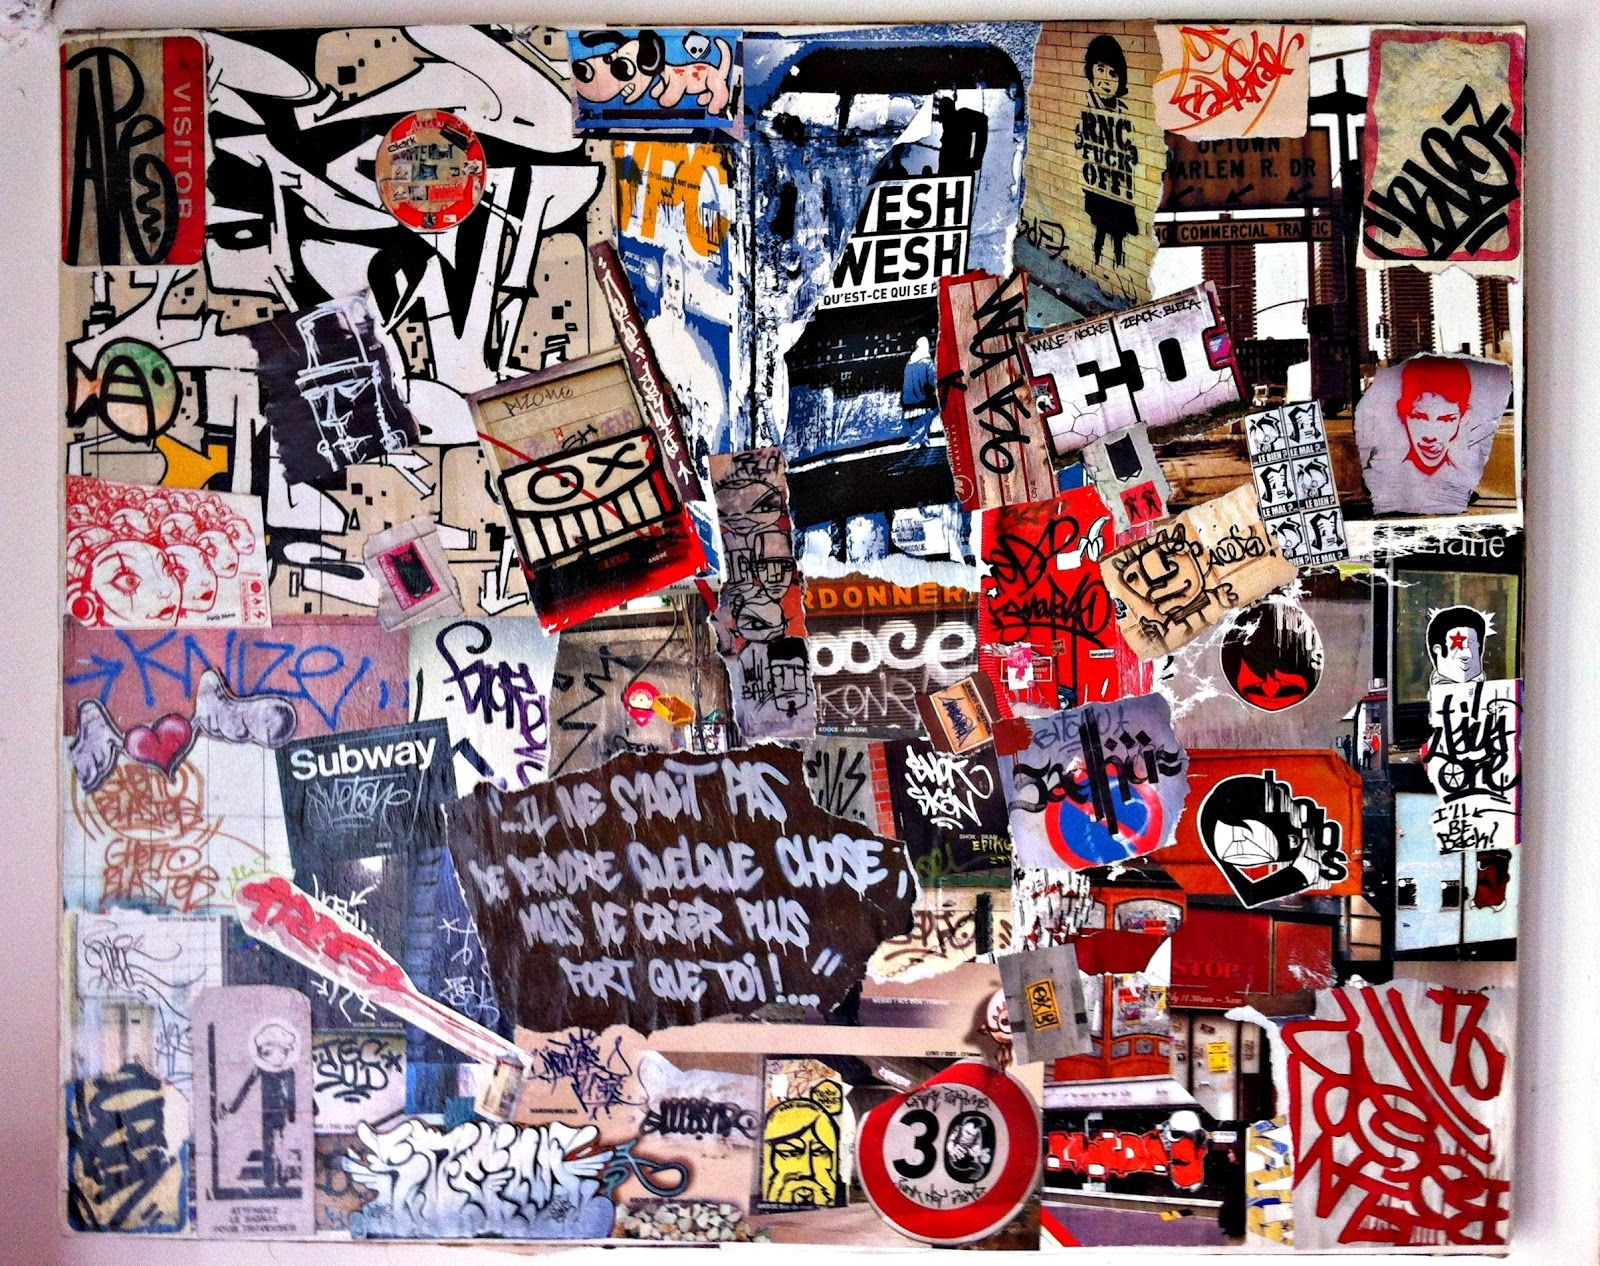 tableau style street art n 1 collage calligraphie asiatique pinterest. Black Bedroom Furniture Sets. Home Design Ideas